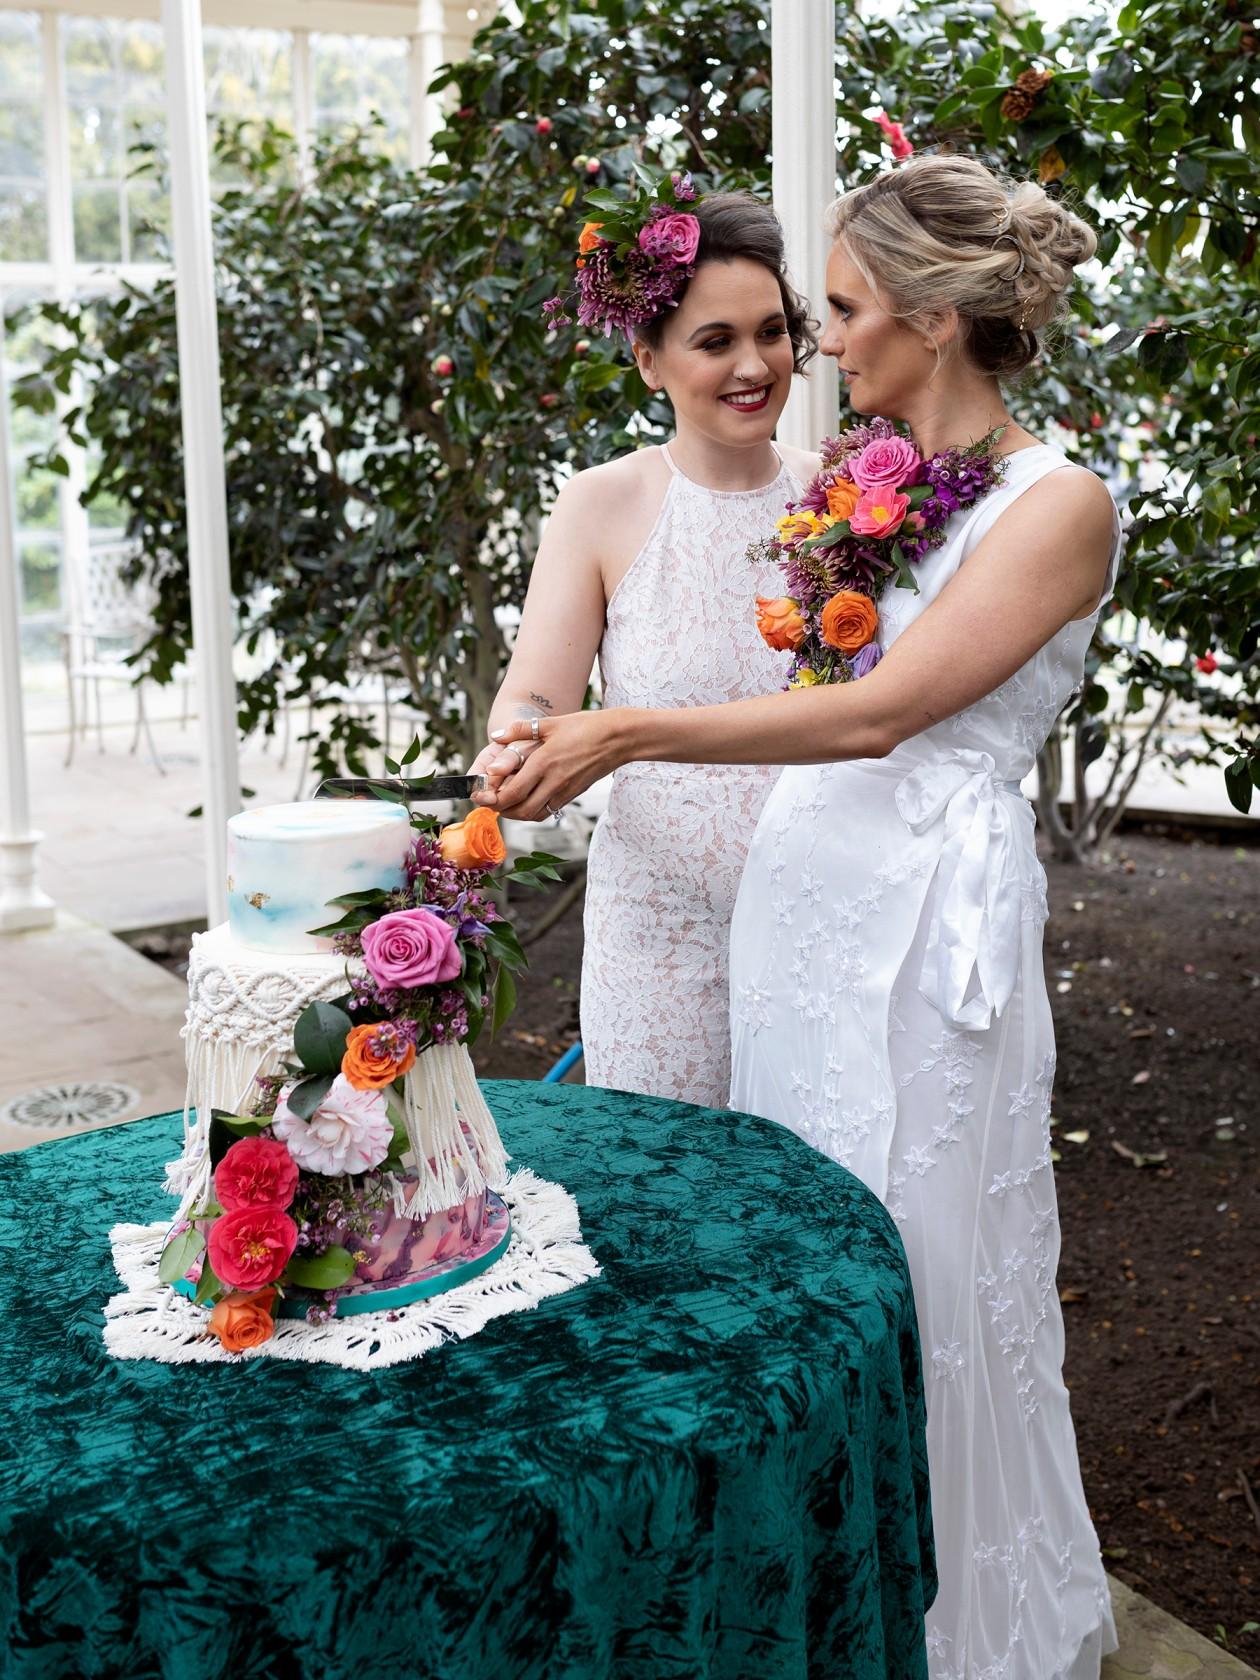 brides cutting cake, modern boho wedding, boho wedding cake - unique wedding cake - colourful wedding flowers